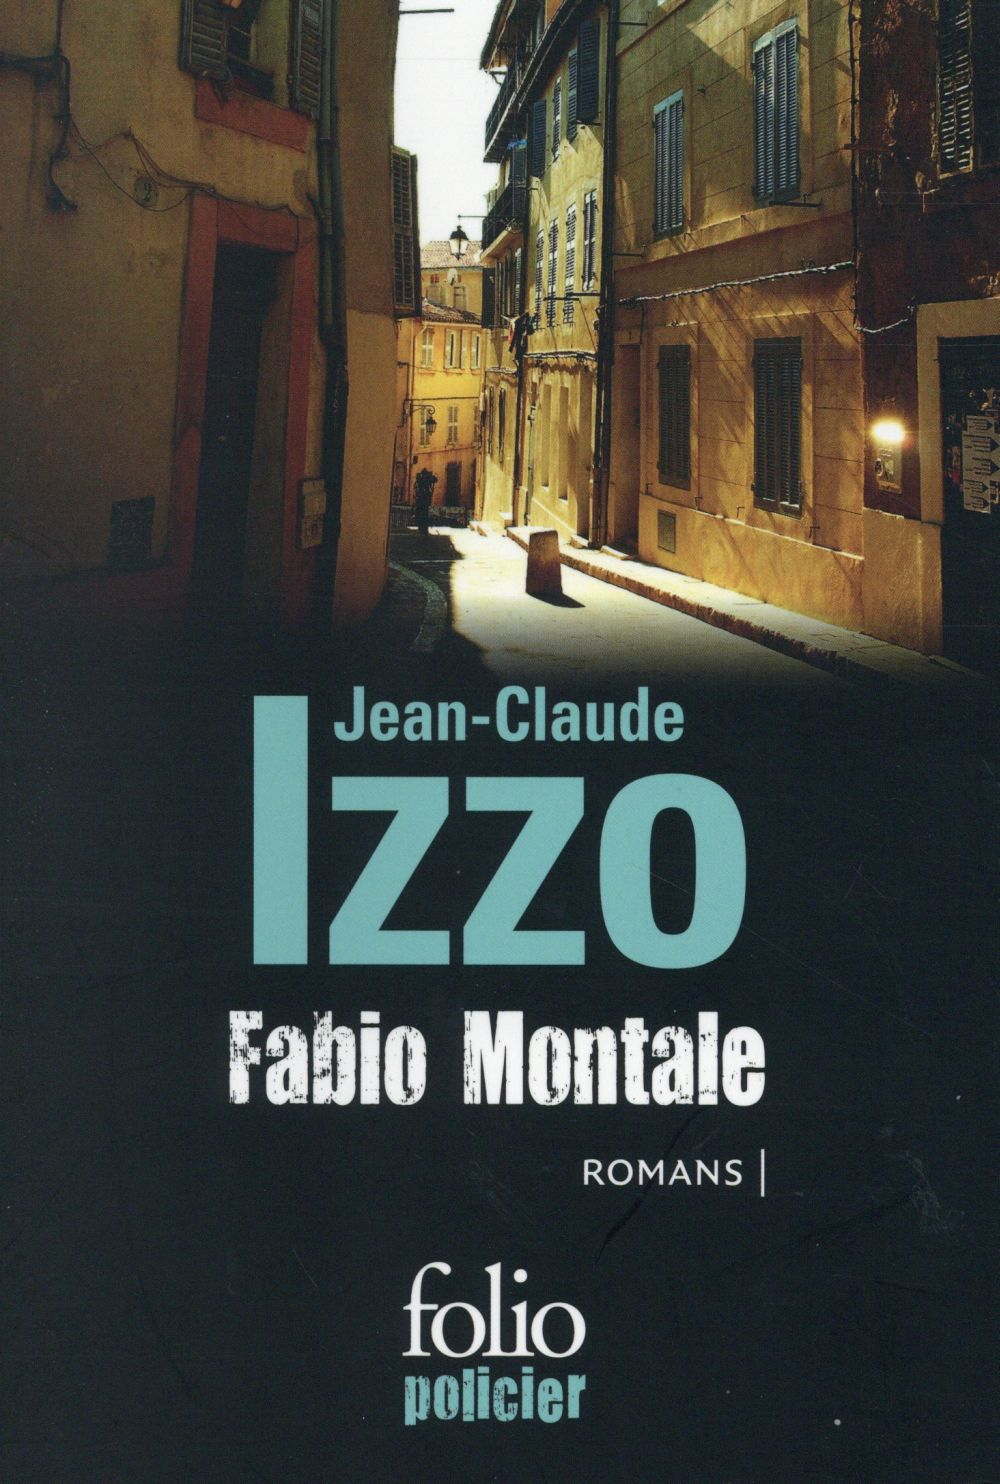 FABIO MONTALE IZZO JEAN-CLAUDE Gallimard